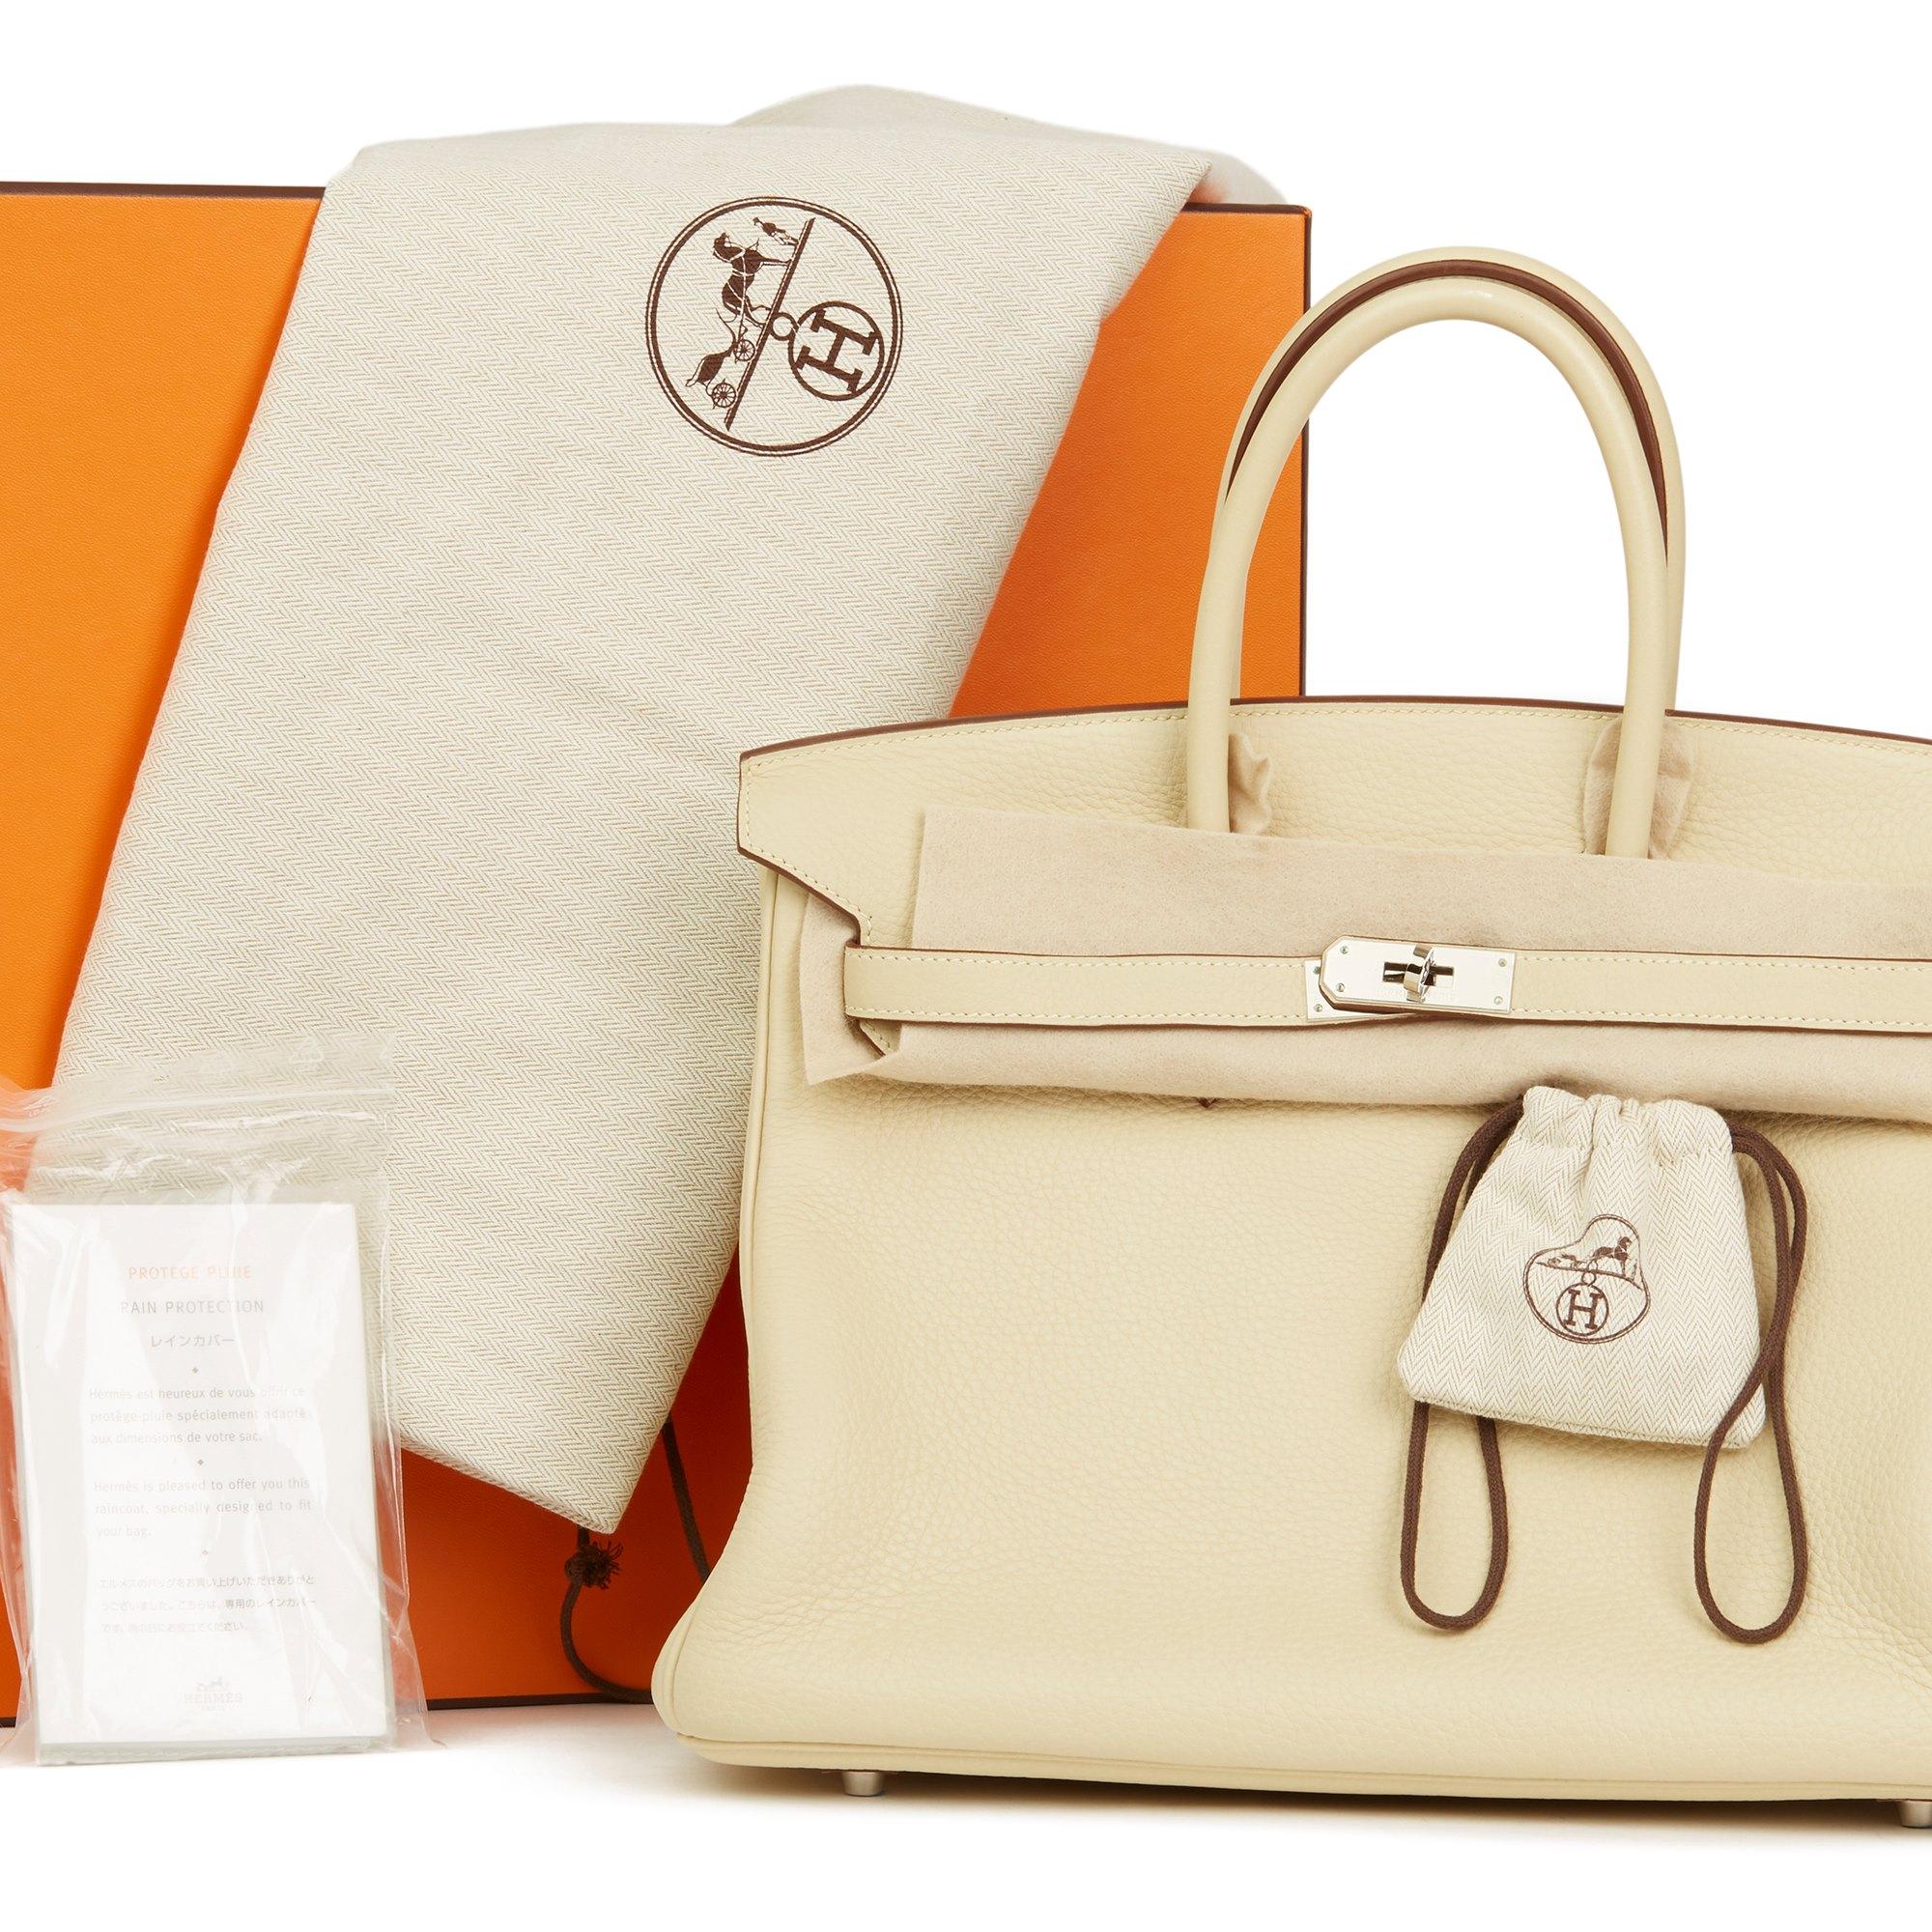 Hermès Parchemin Clemence Leather Birkin 35cm